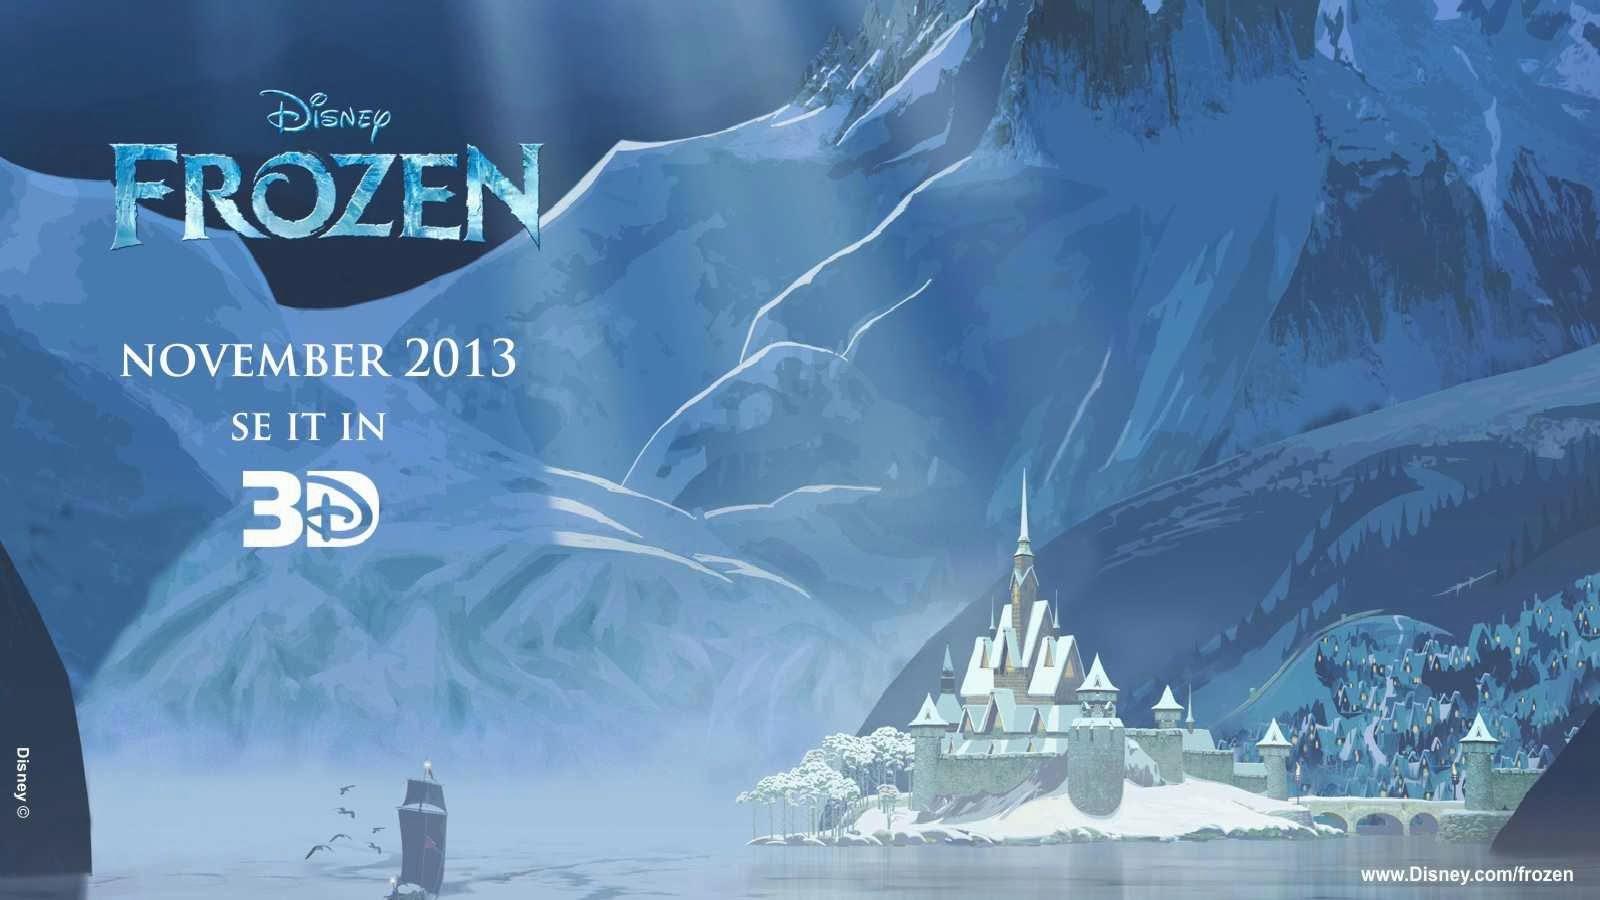 Frozen HD Wallpapers - Disnep 3D Movie - HD Wallpapers Blog